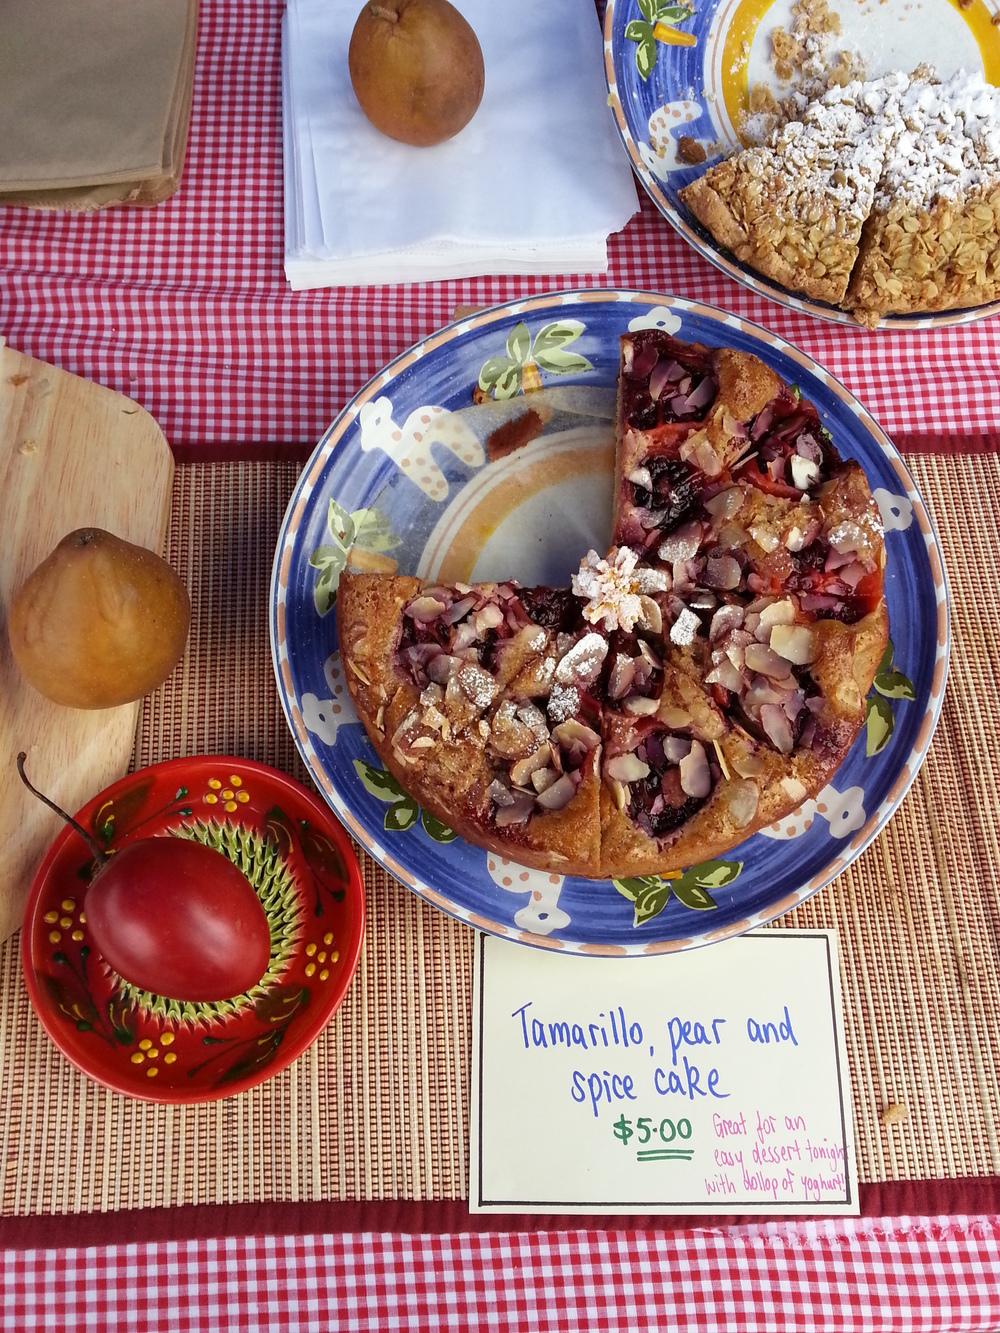 Spiced tamarillo and almond cake